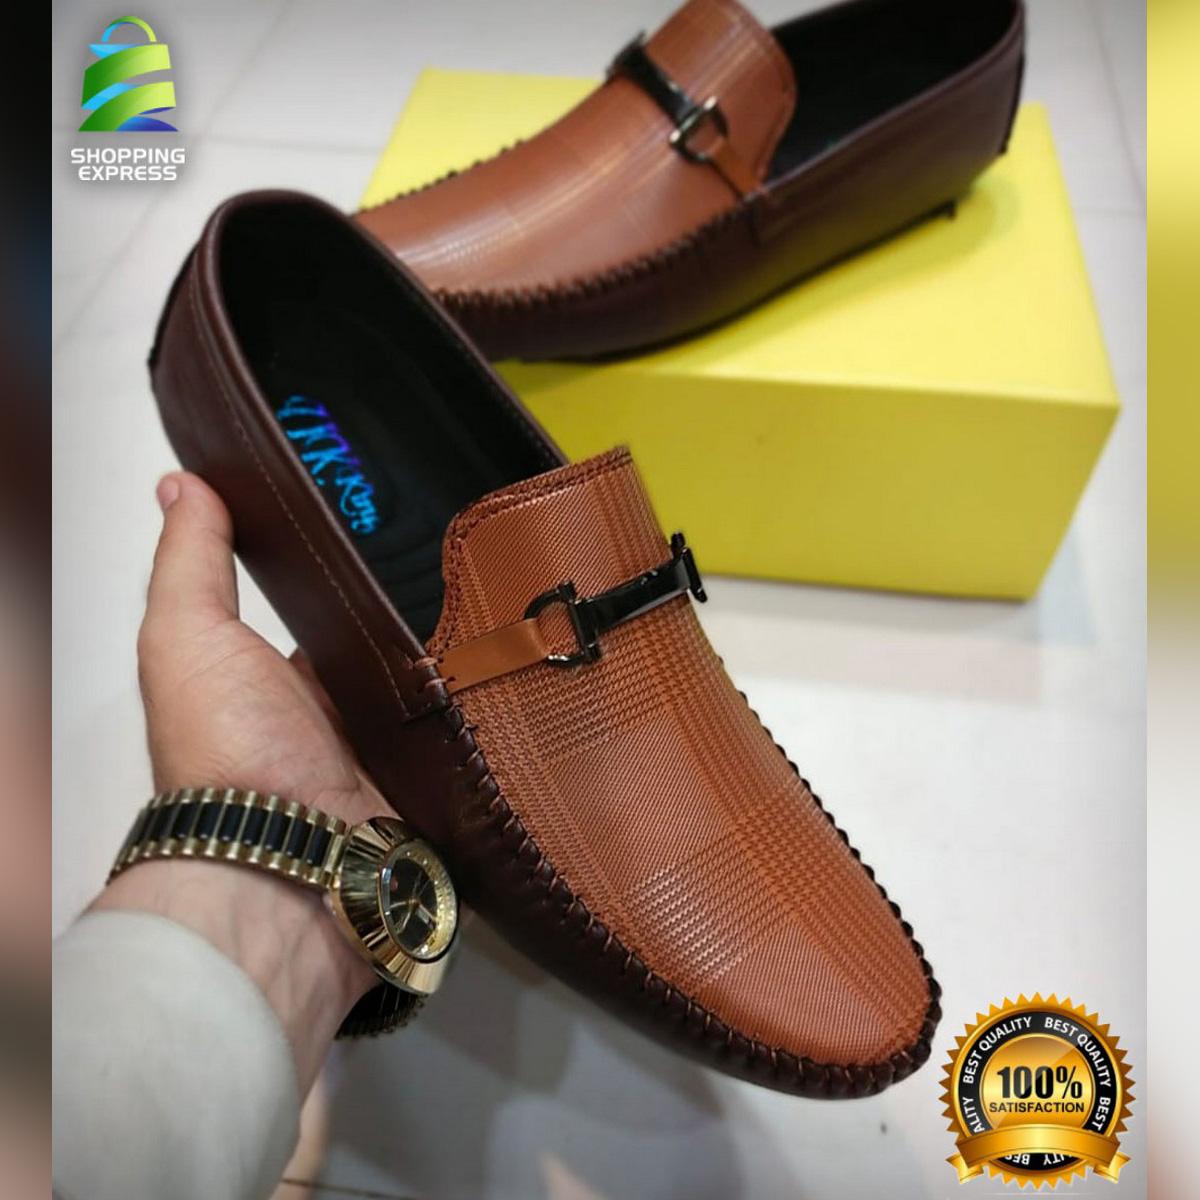 Premium Quality - Men shoes - Loafers for men